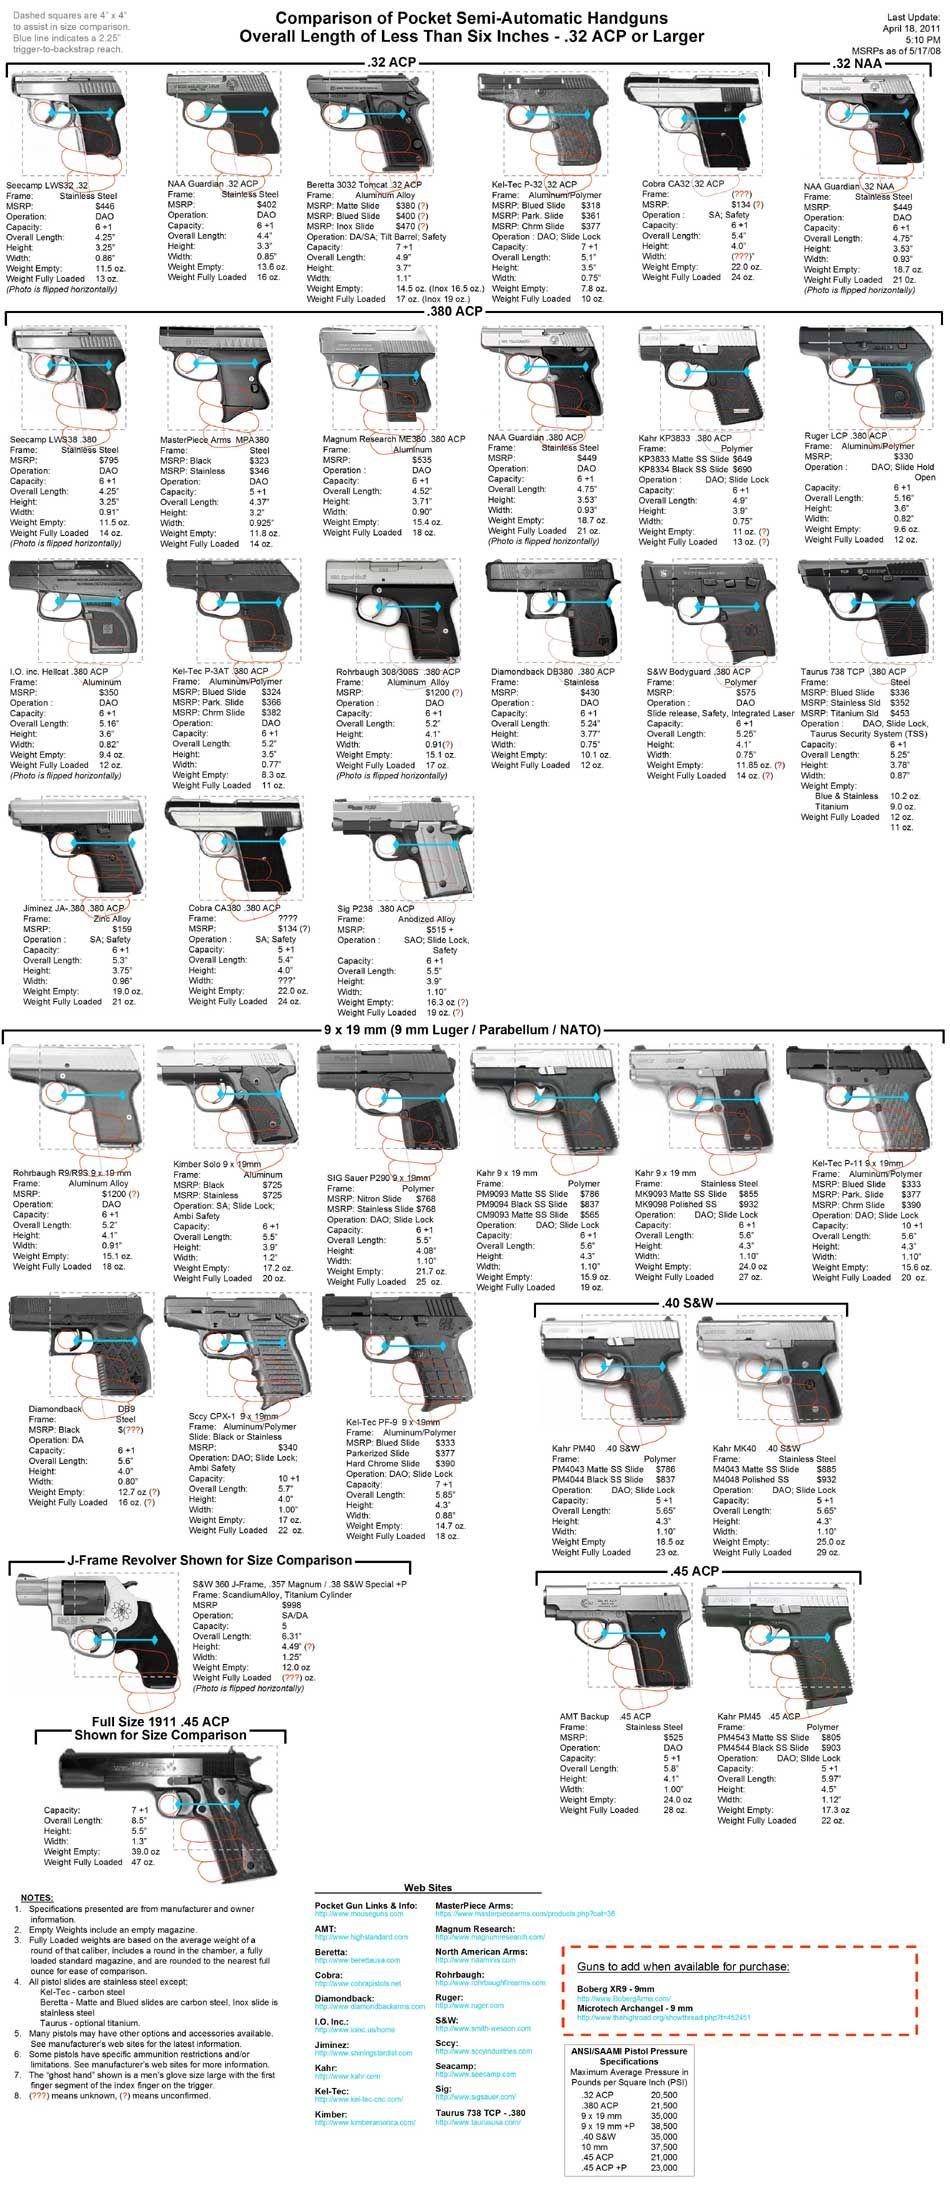 Size comparison of pocket semi-automatic handguns with